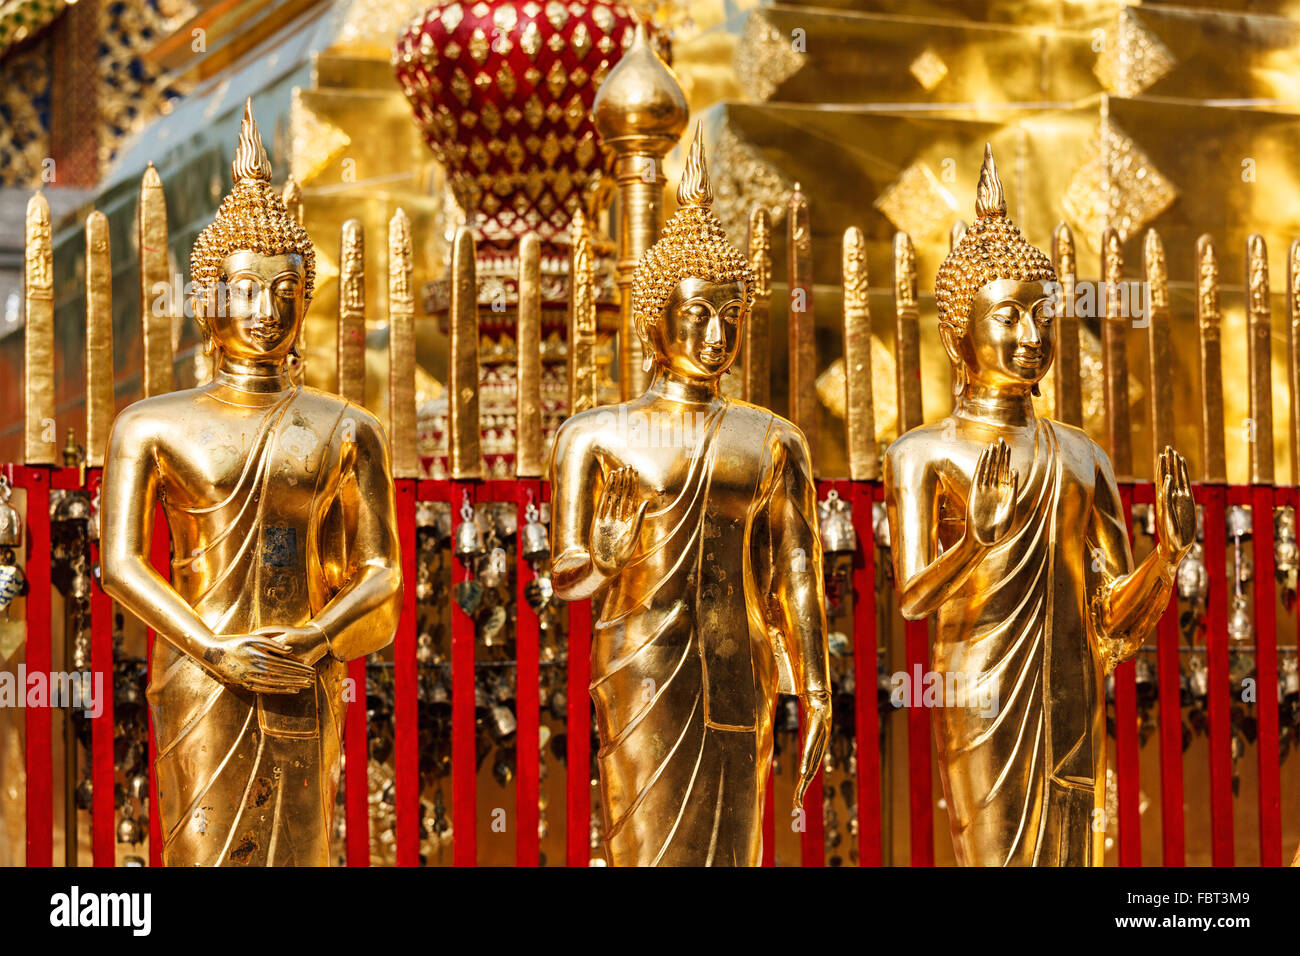 Gold Buddha statues in Wat Phra That Doi Suthep - Stock Image